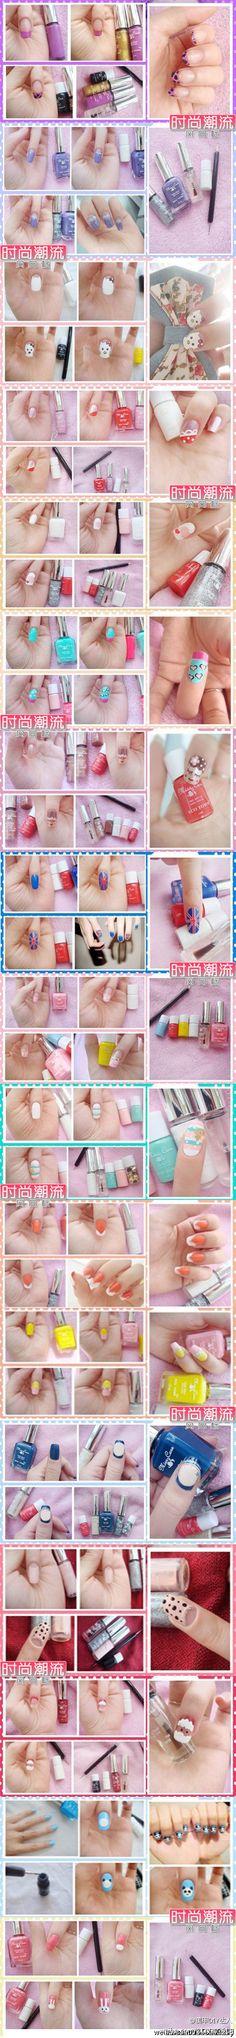 17 beautiful nail